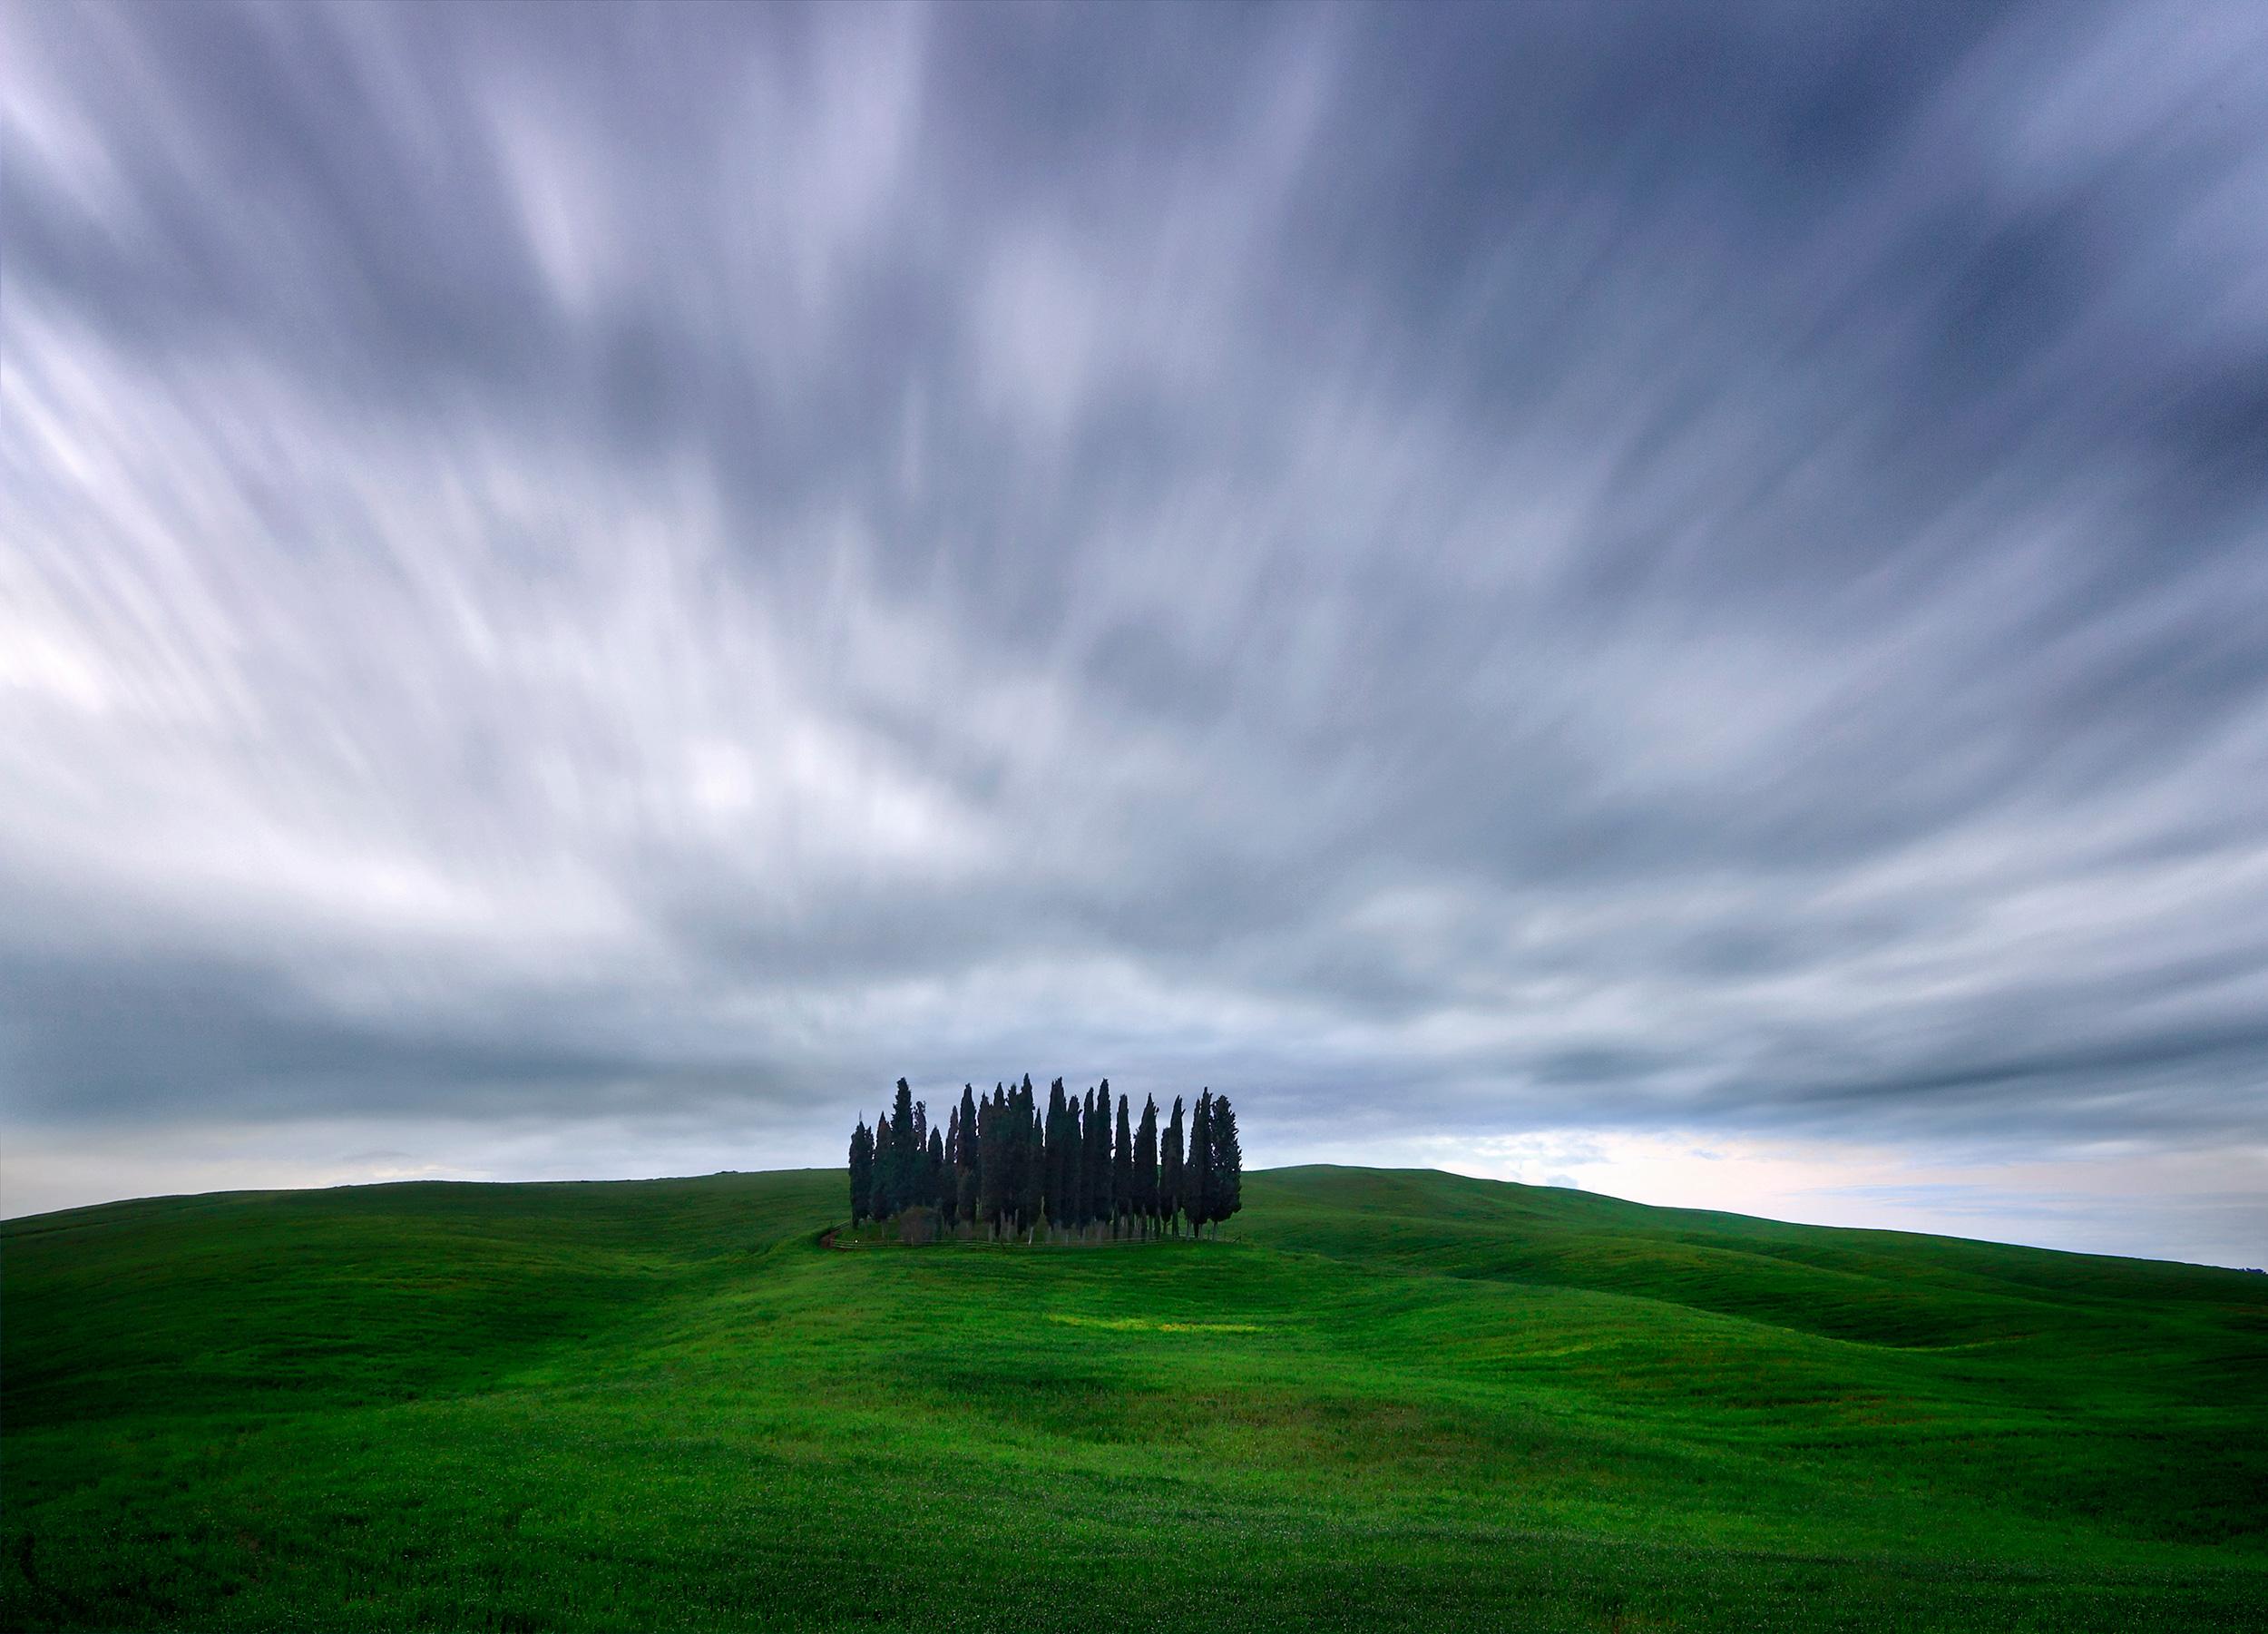 Cypress trees of San Quirico d'Orcia - Valdorcia, Tuscany, Italy